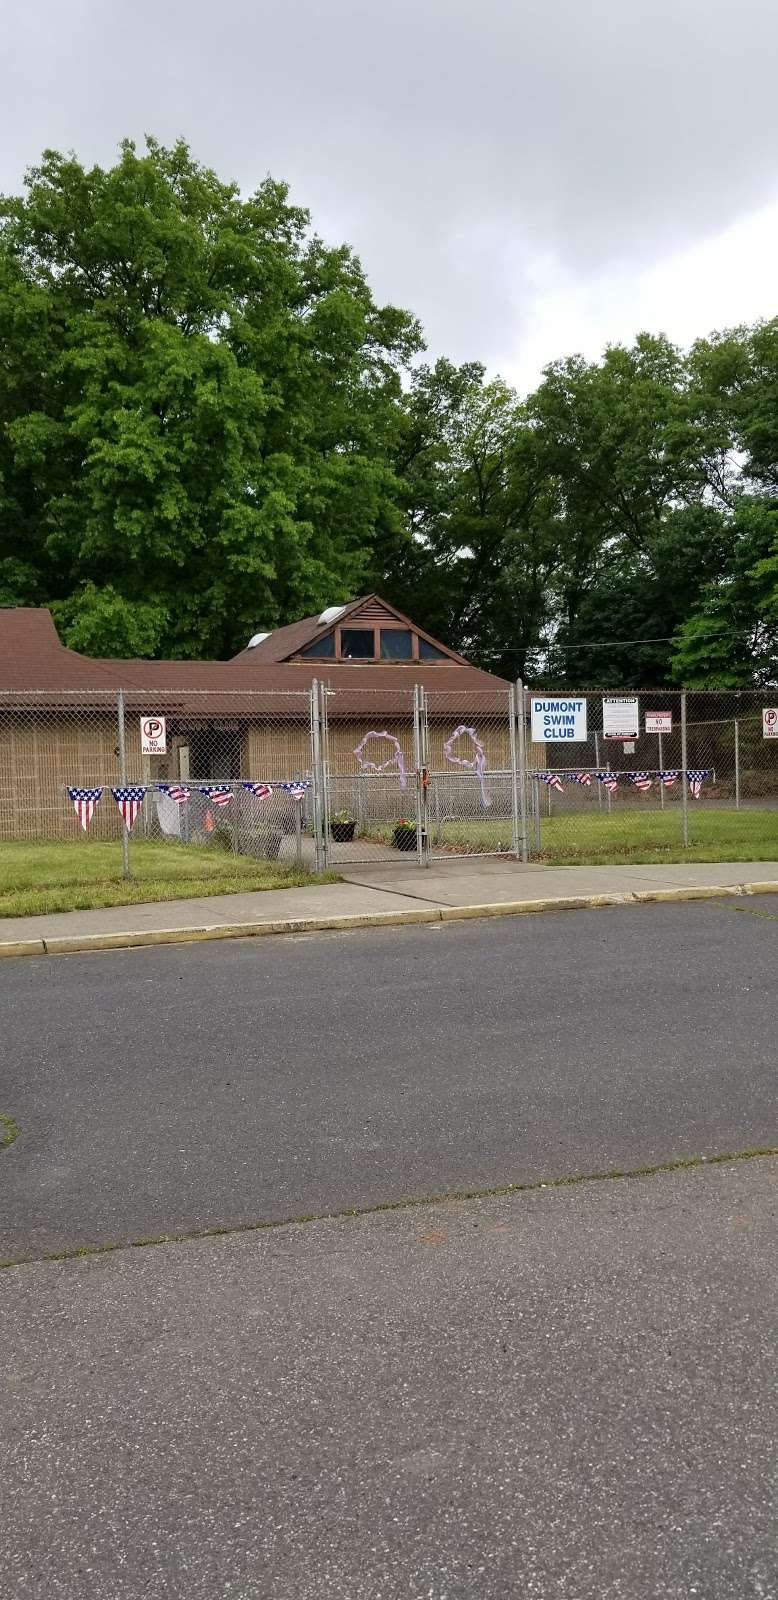 Vivyen Field - park    Photo 9 of 10   Address: 299 N Vivyen St, Bergenfield, NJ 07621, USA